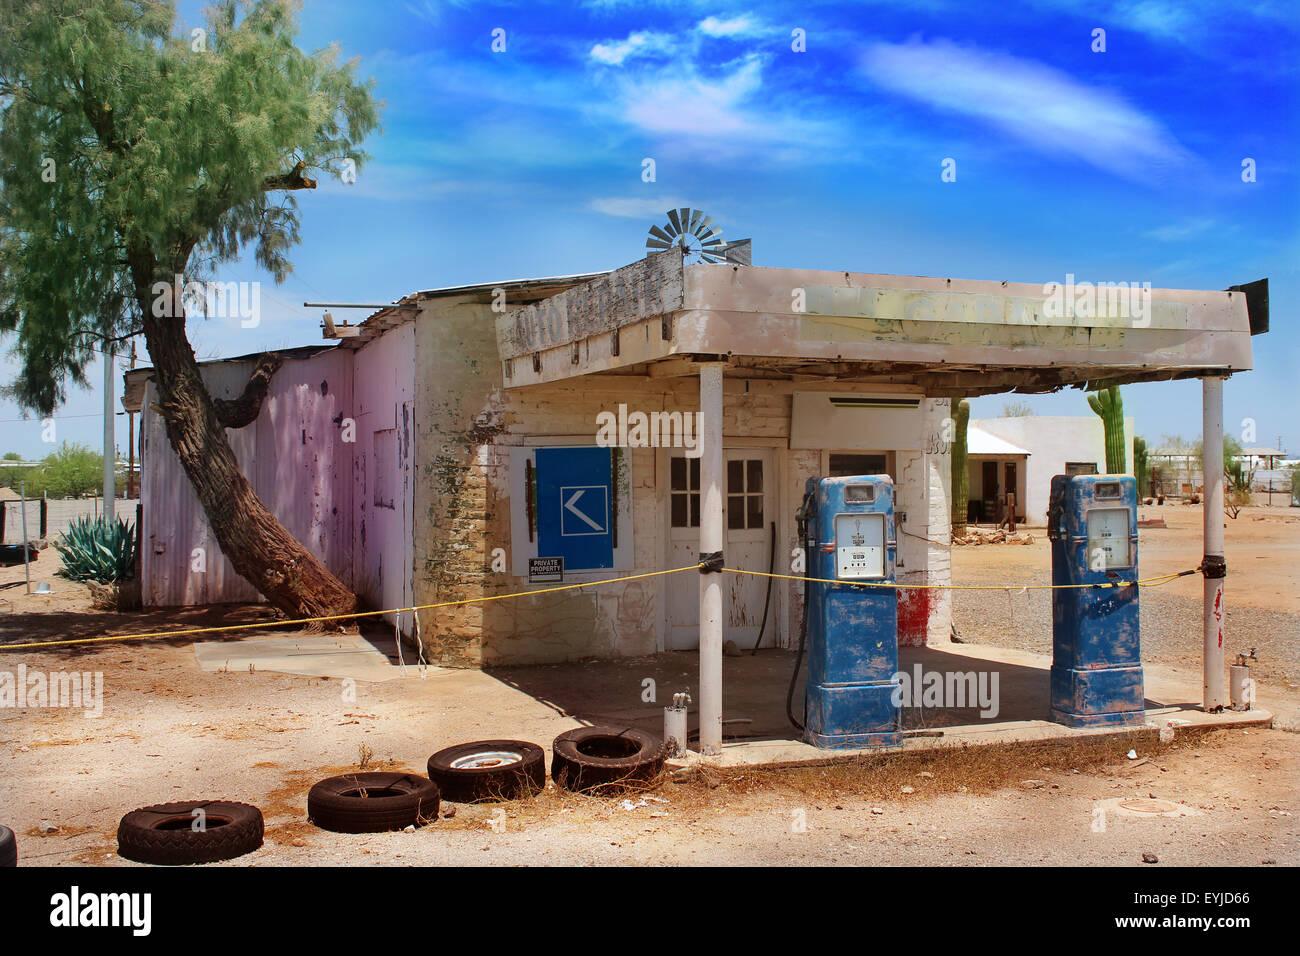 Old Abandoned Gas Station In Arizona Desert Stock Photo Alamy